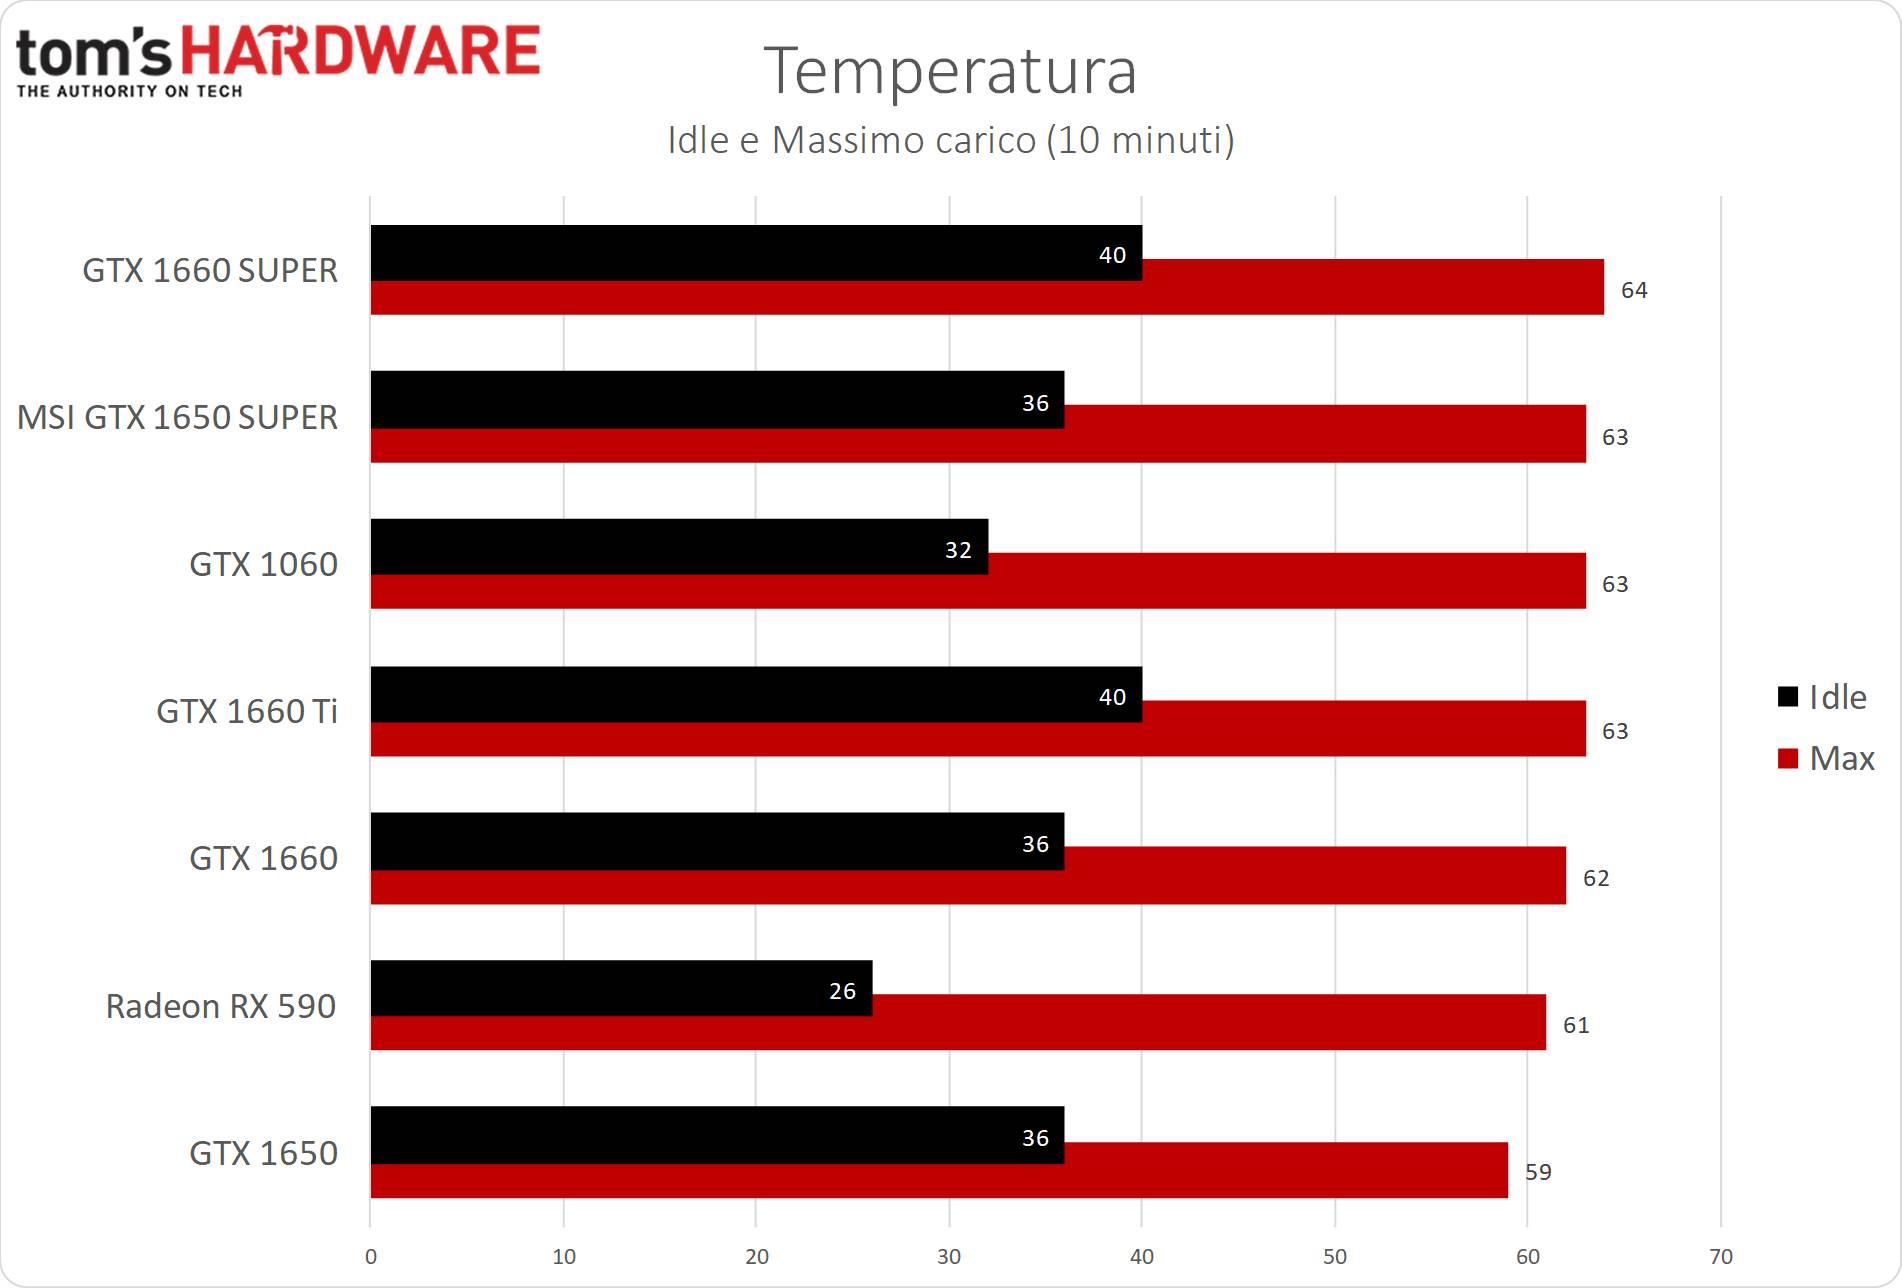 GeForce GTX 1650 SUPER temperatura